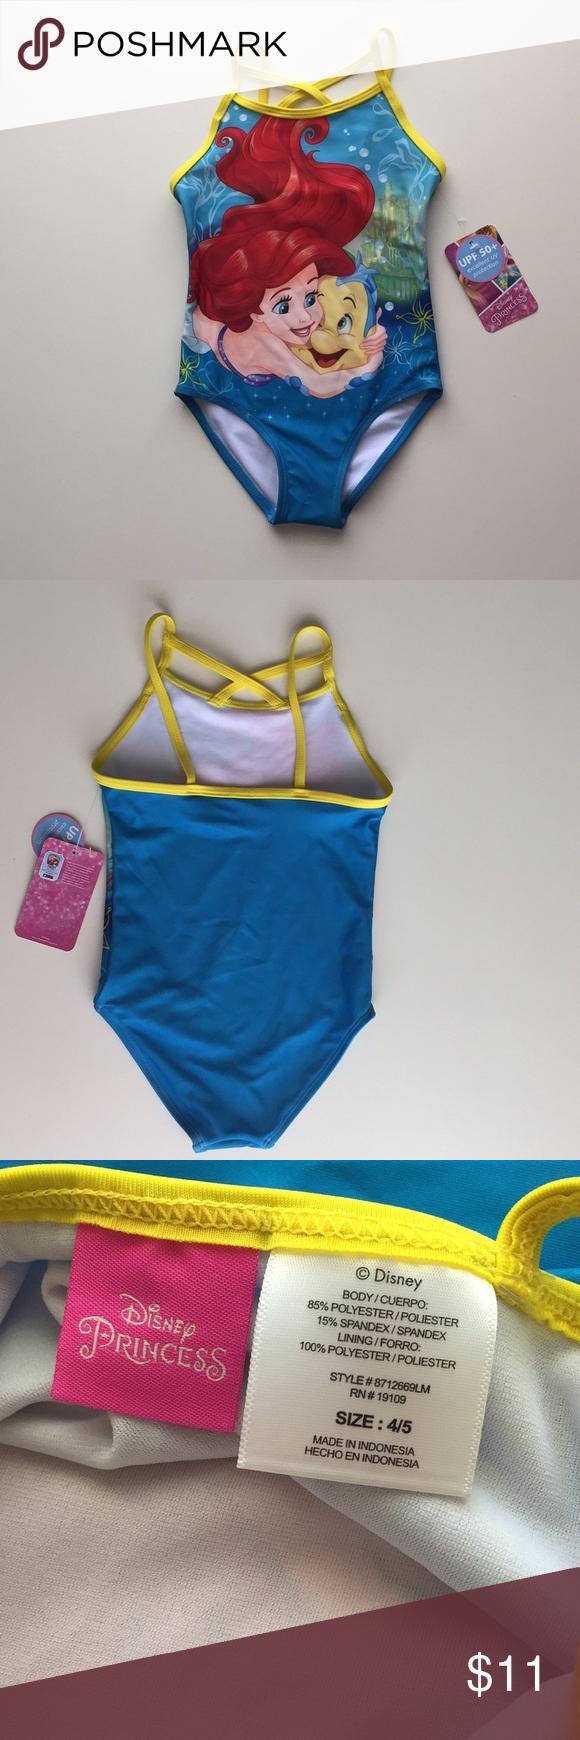 fdd6585e1e94f Disney little mermaid 4/5 kid swim suit Disney princess ariel size 4 ...